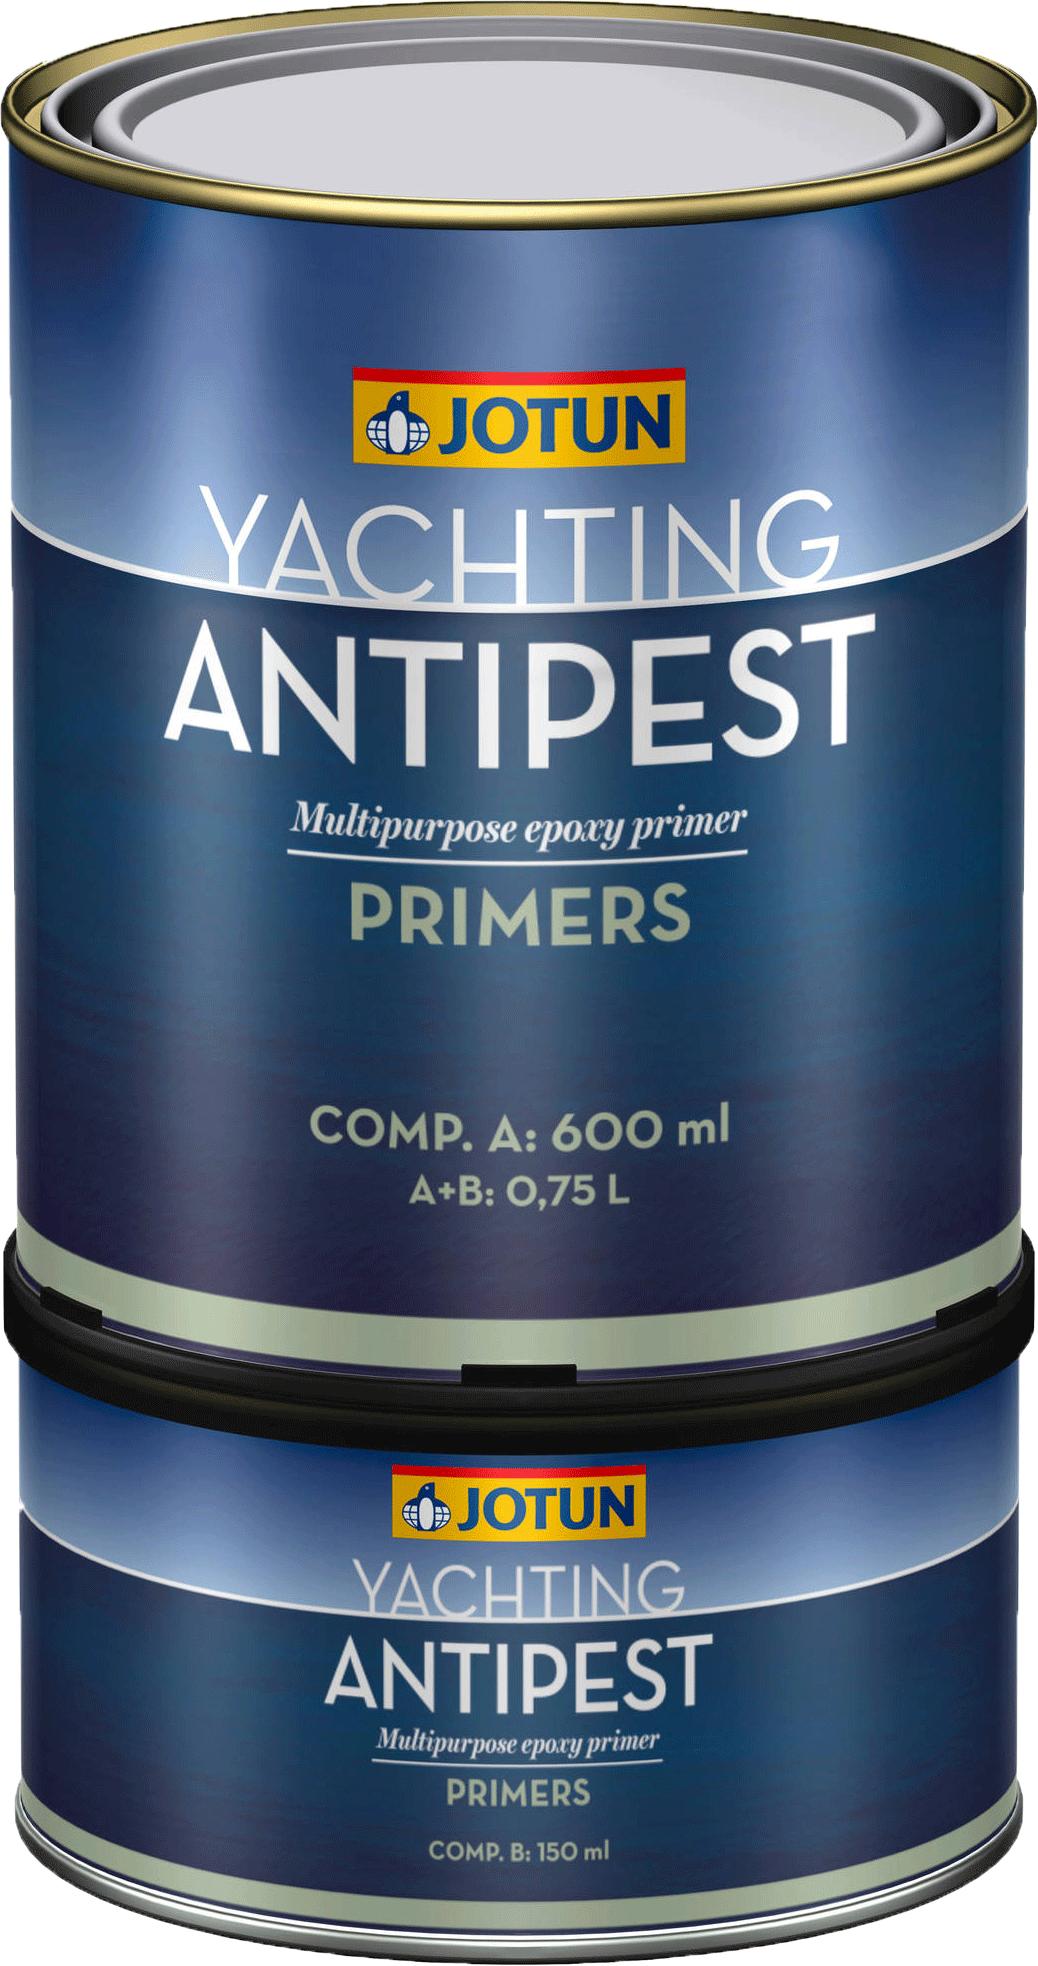 0,75L_Yachting_AntiPest-klipt